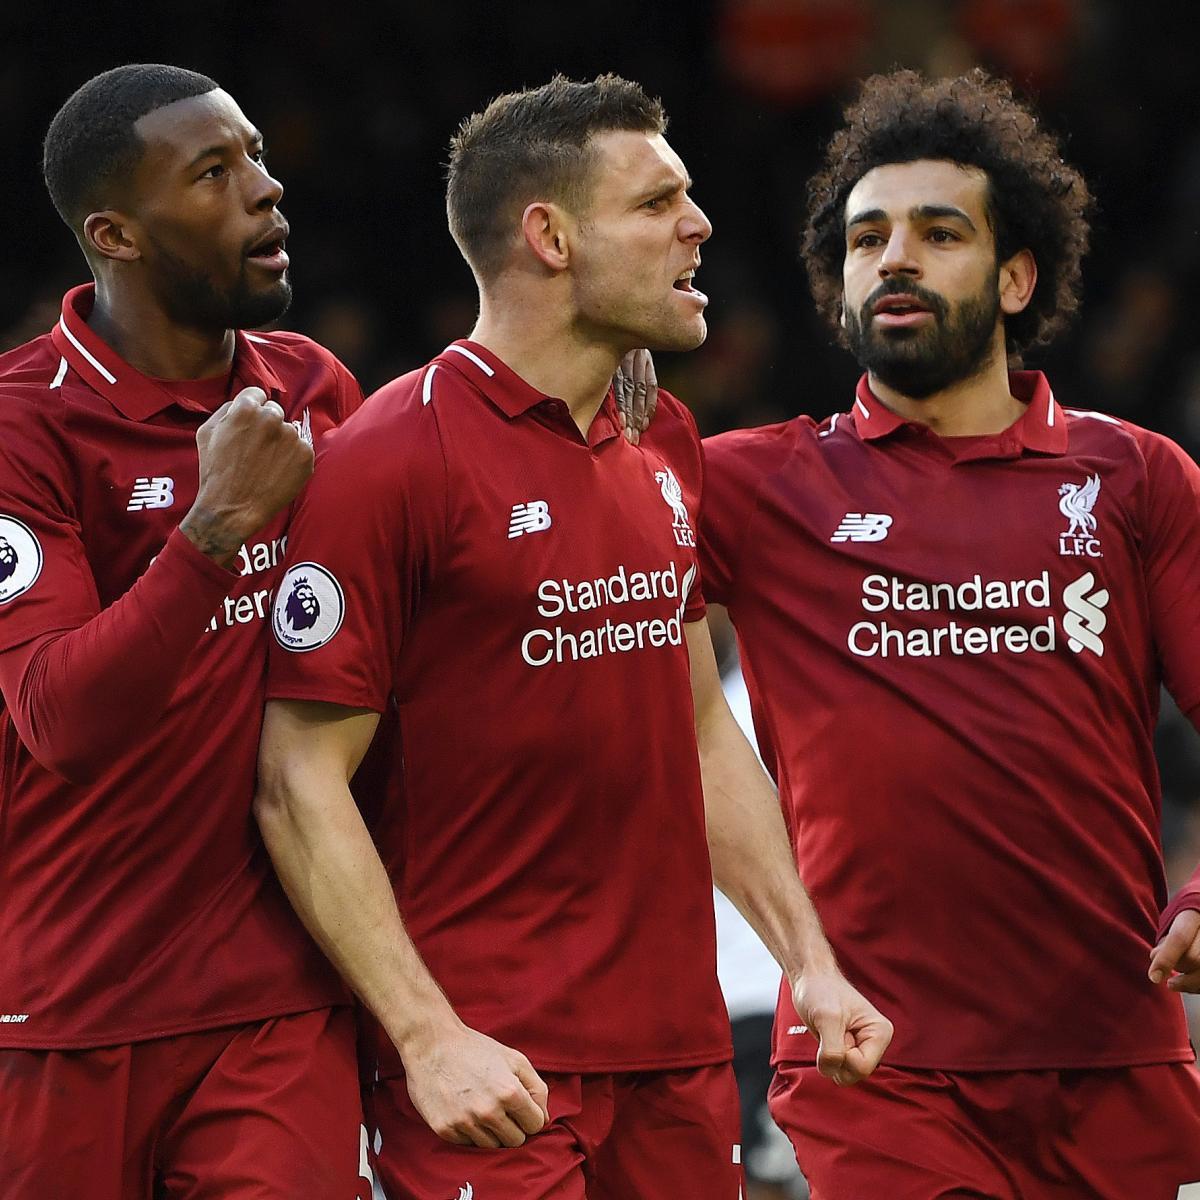 Epl table 2019 premier league standings after sunday 39 s - Barclays premier league ranking table ...